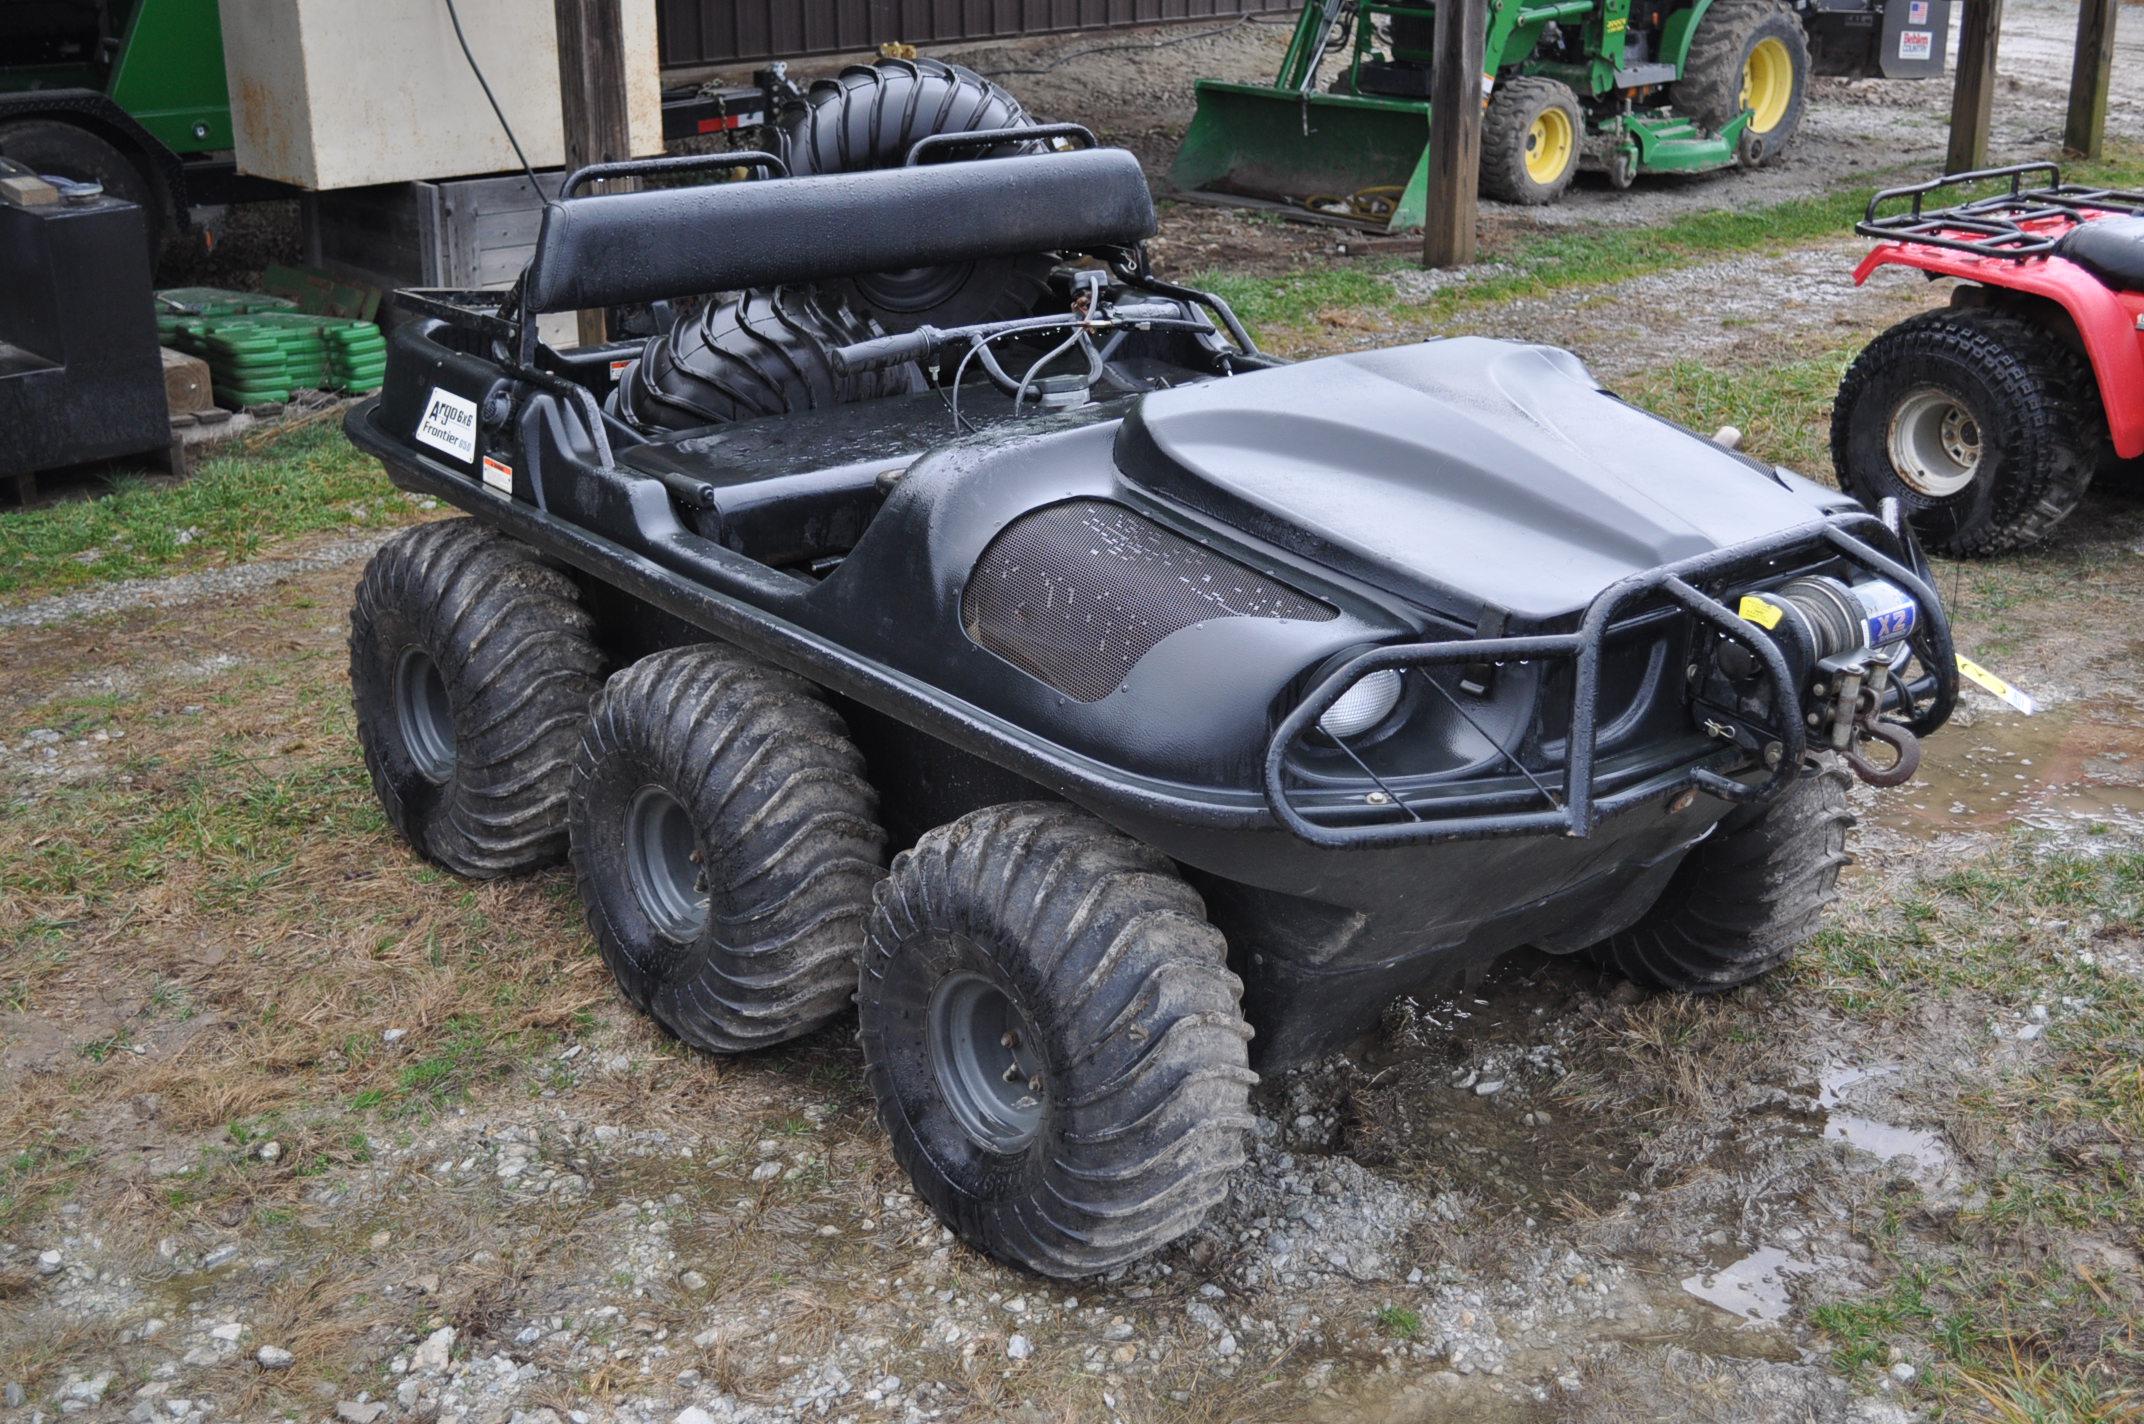 2008 Argo Frontier 650 6x6 ATV, 24 x 10.00-8 tires, 256 hrs - Image 4 of 8